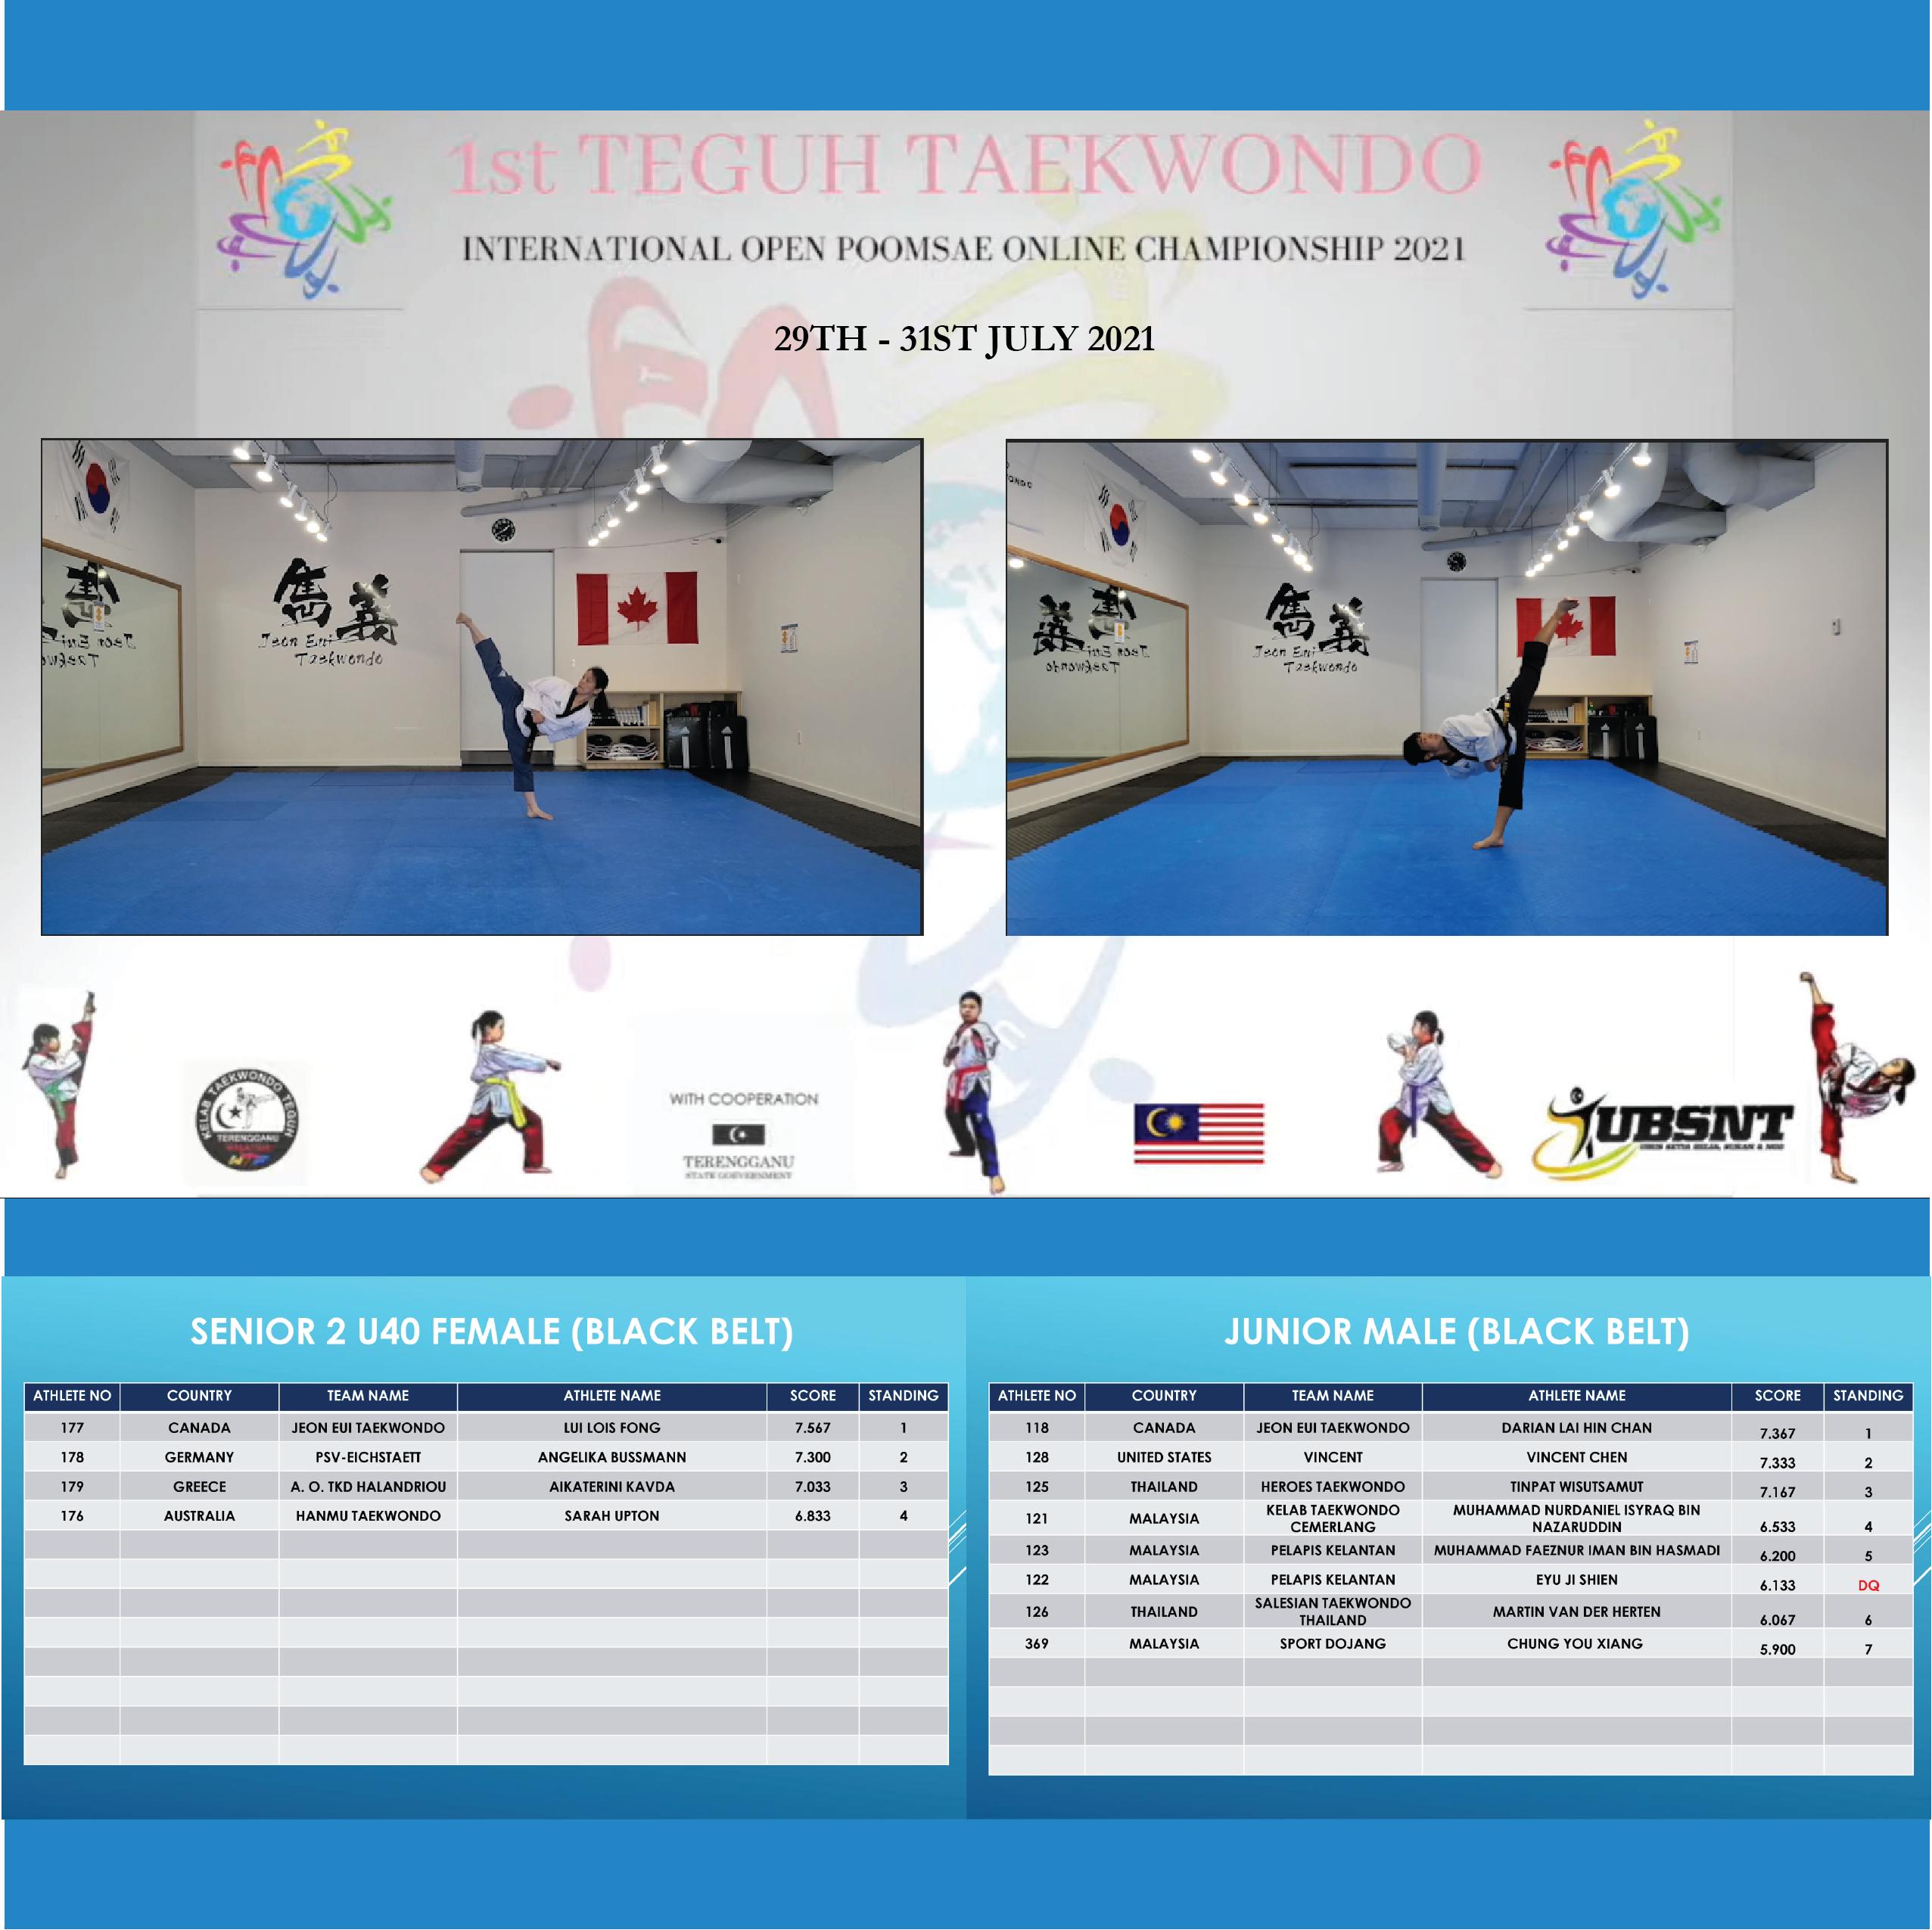 1st Teguh Taekwondo International Open Poomsae Championships 2021 (Malaysia)